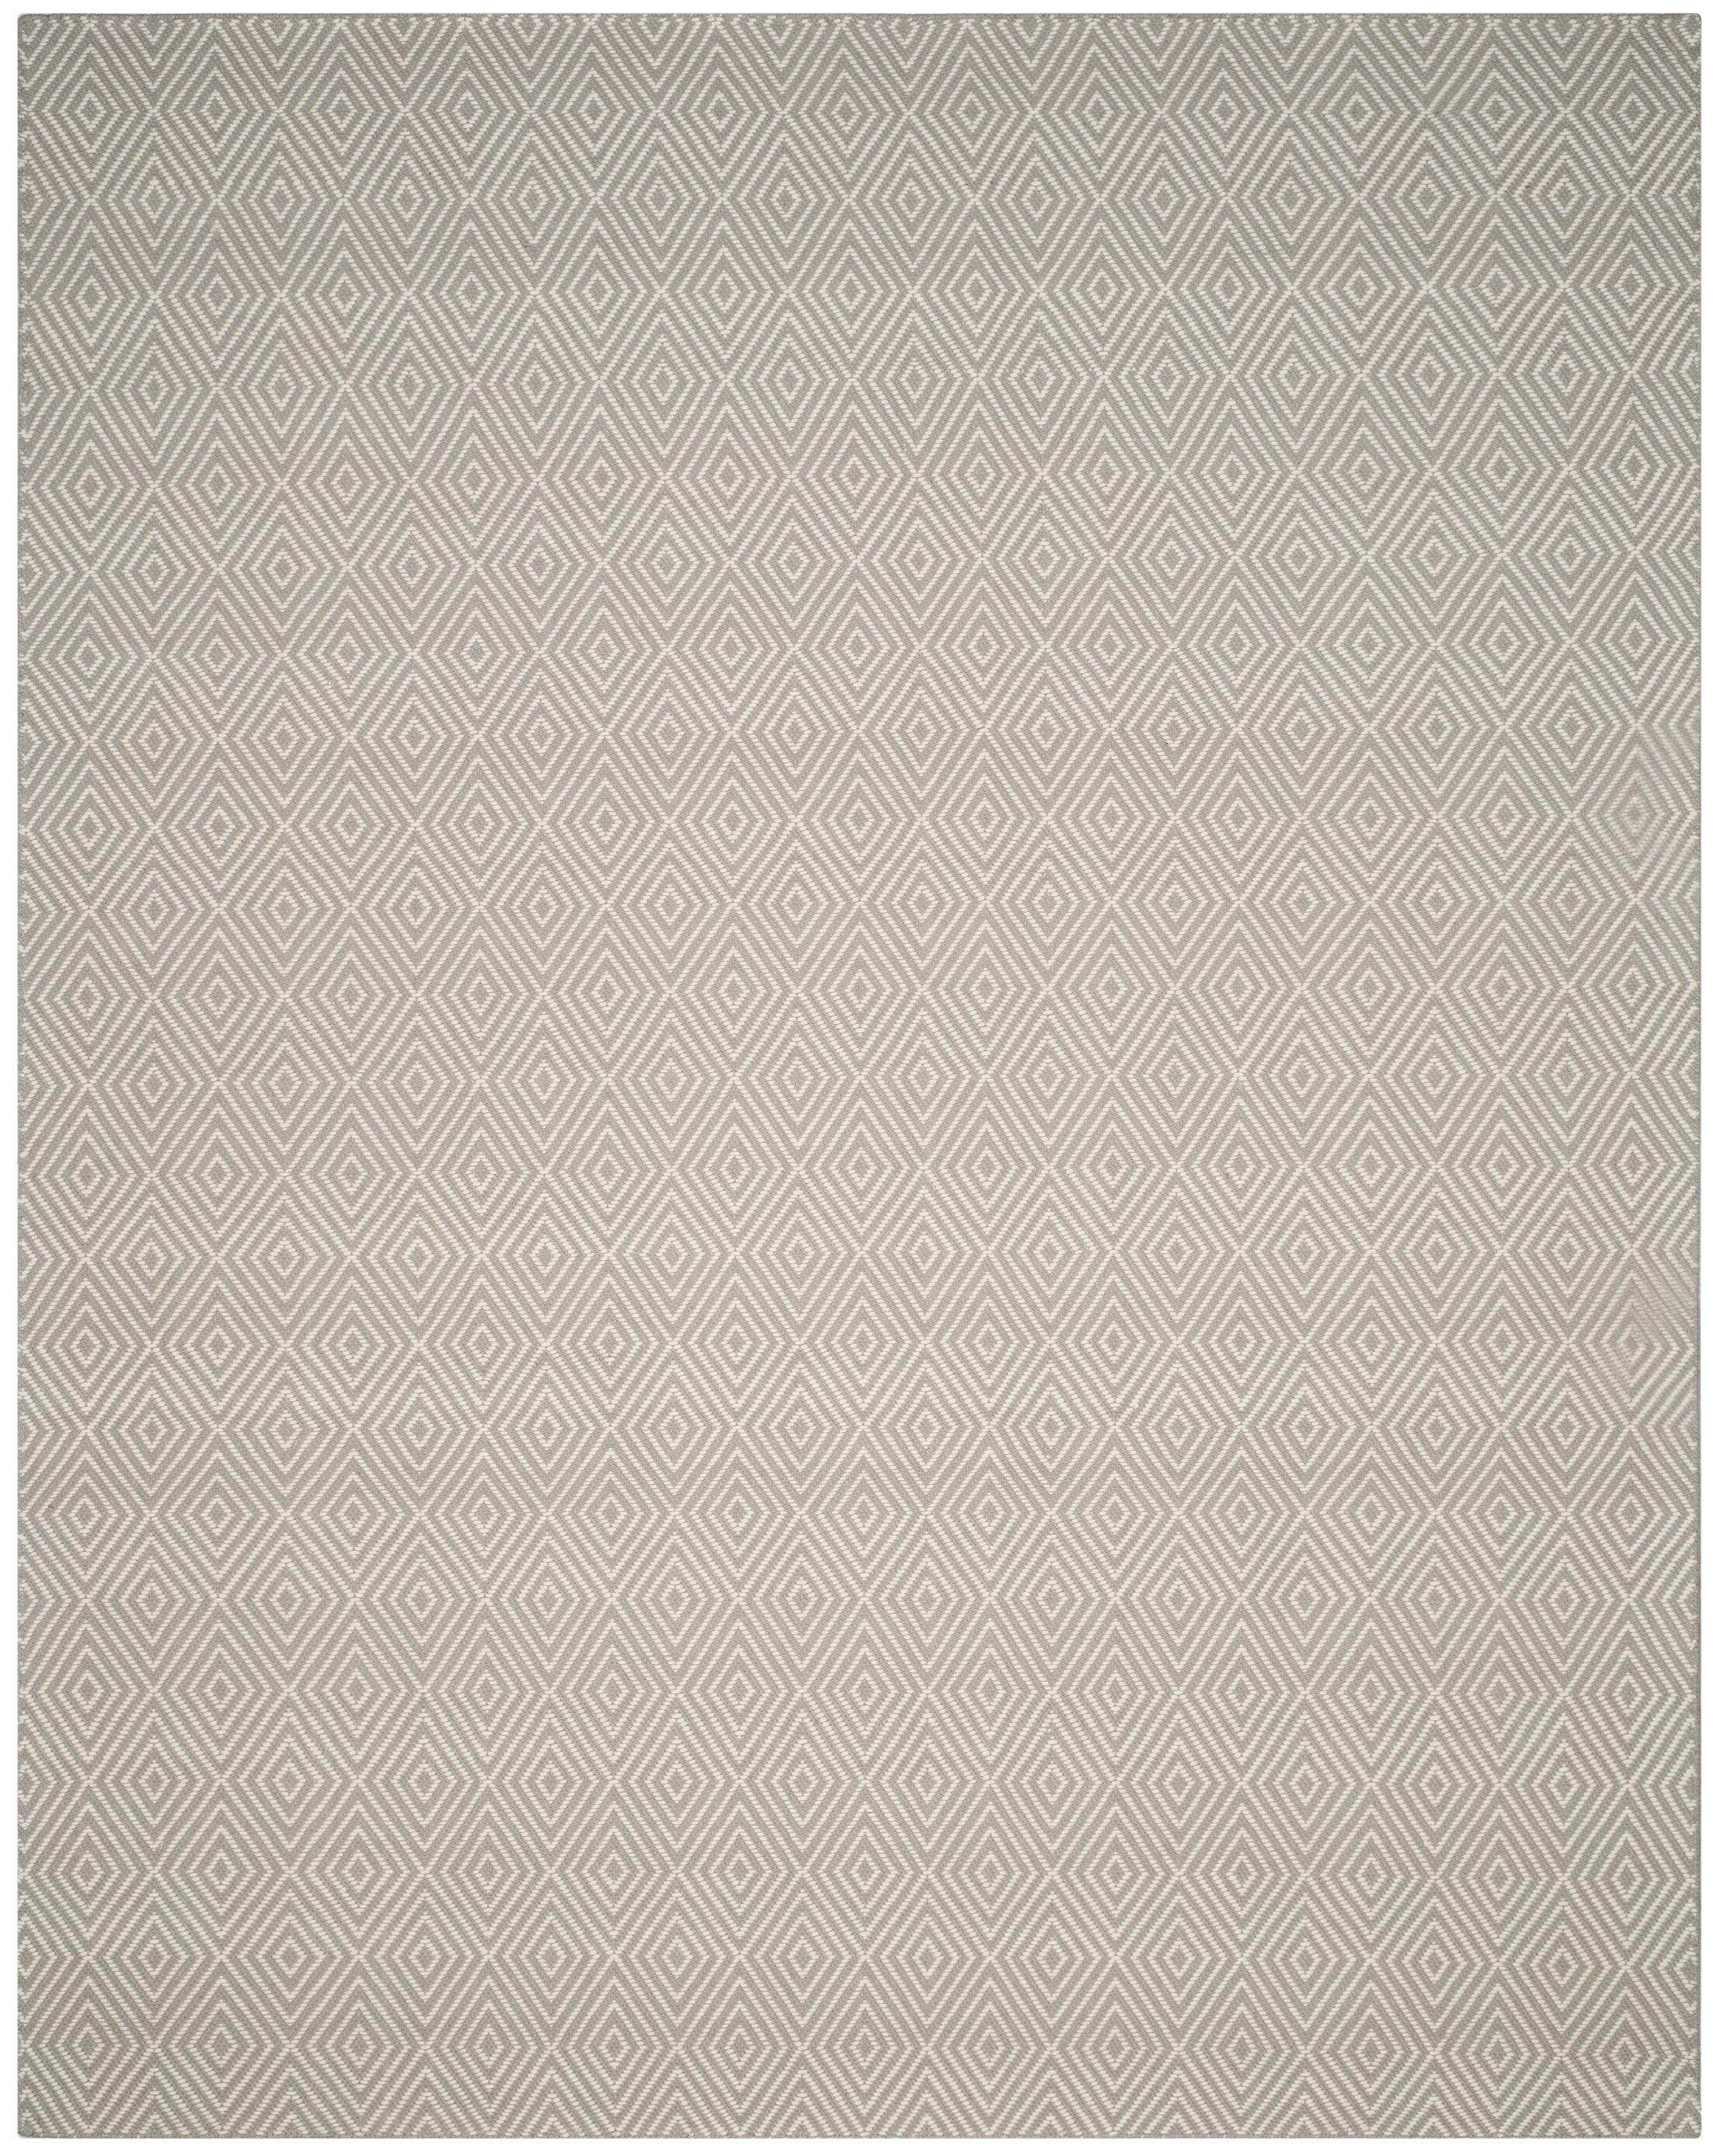 Kris Light Gray Rug Rug Size: Rectangle 9' x 12'